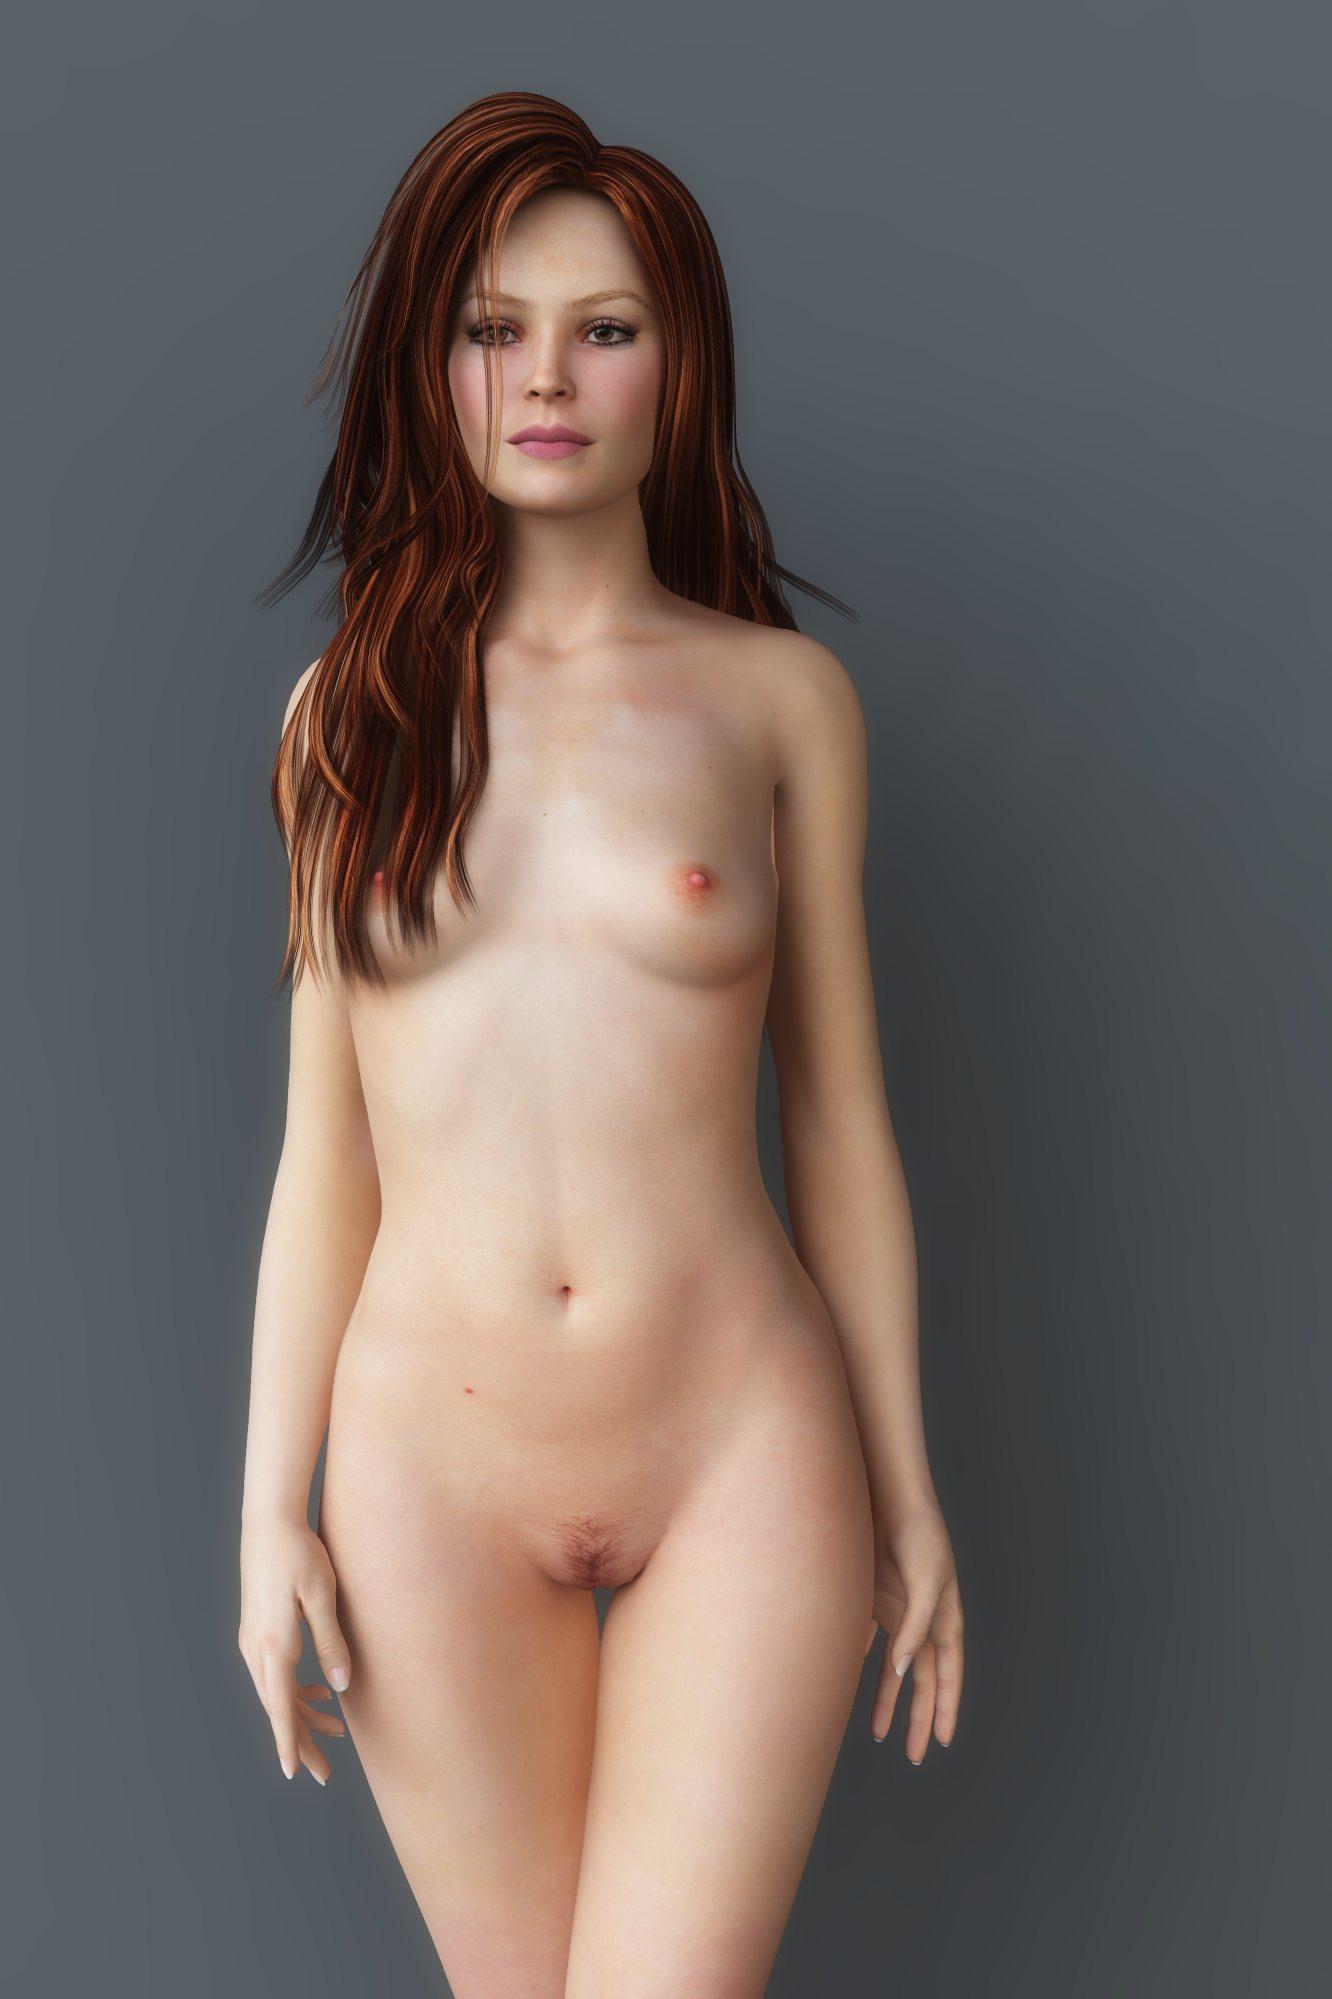 An elderly woman naked